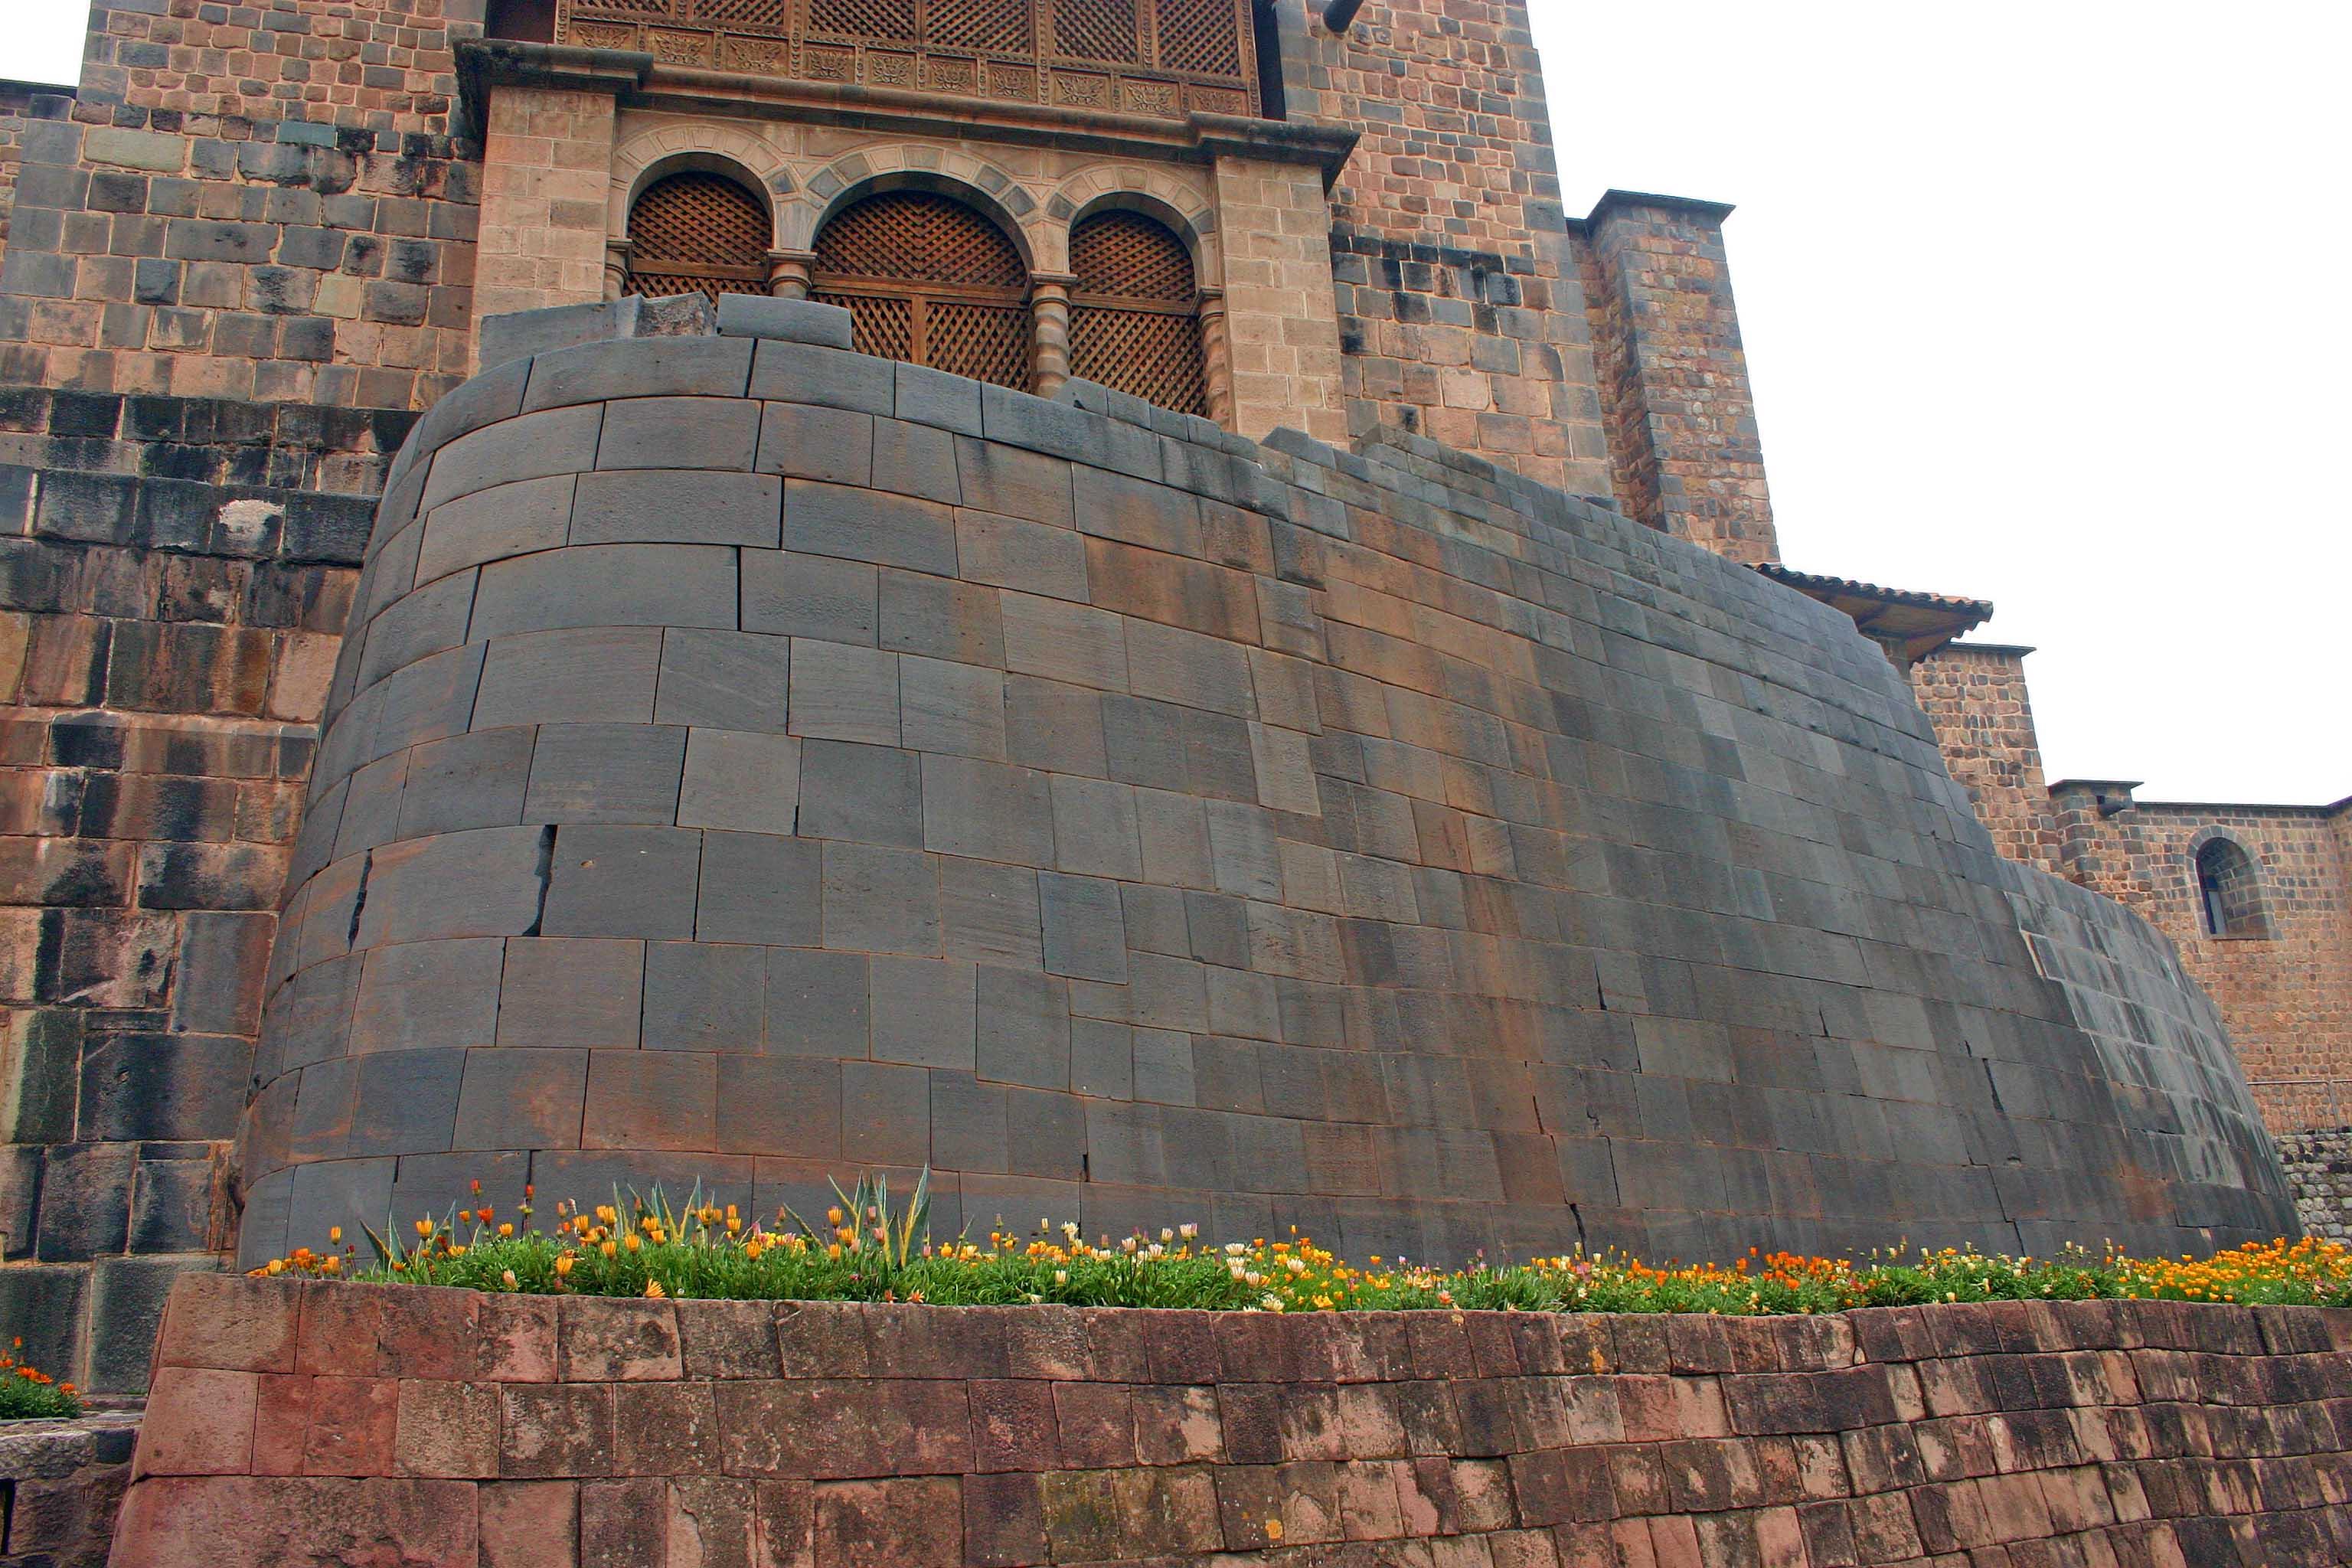 Peru - Page 2 Inca_stone_wall_from_the_temple_of_Coricancha_Cuzco_Peru_copy